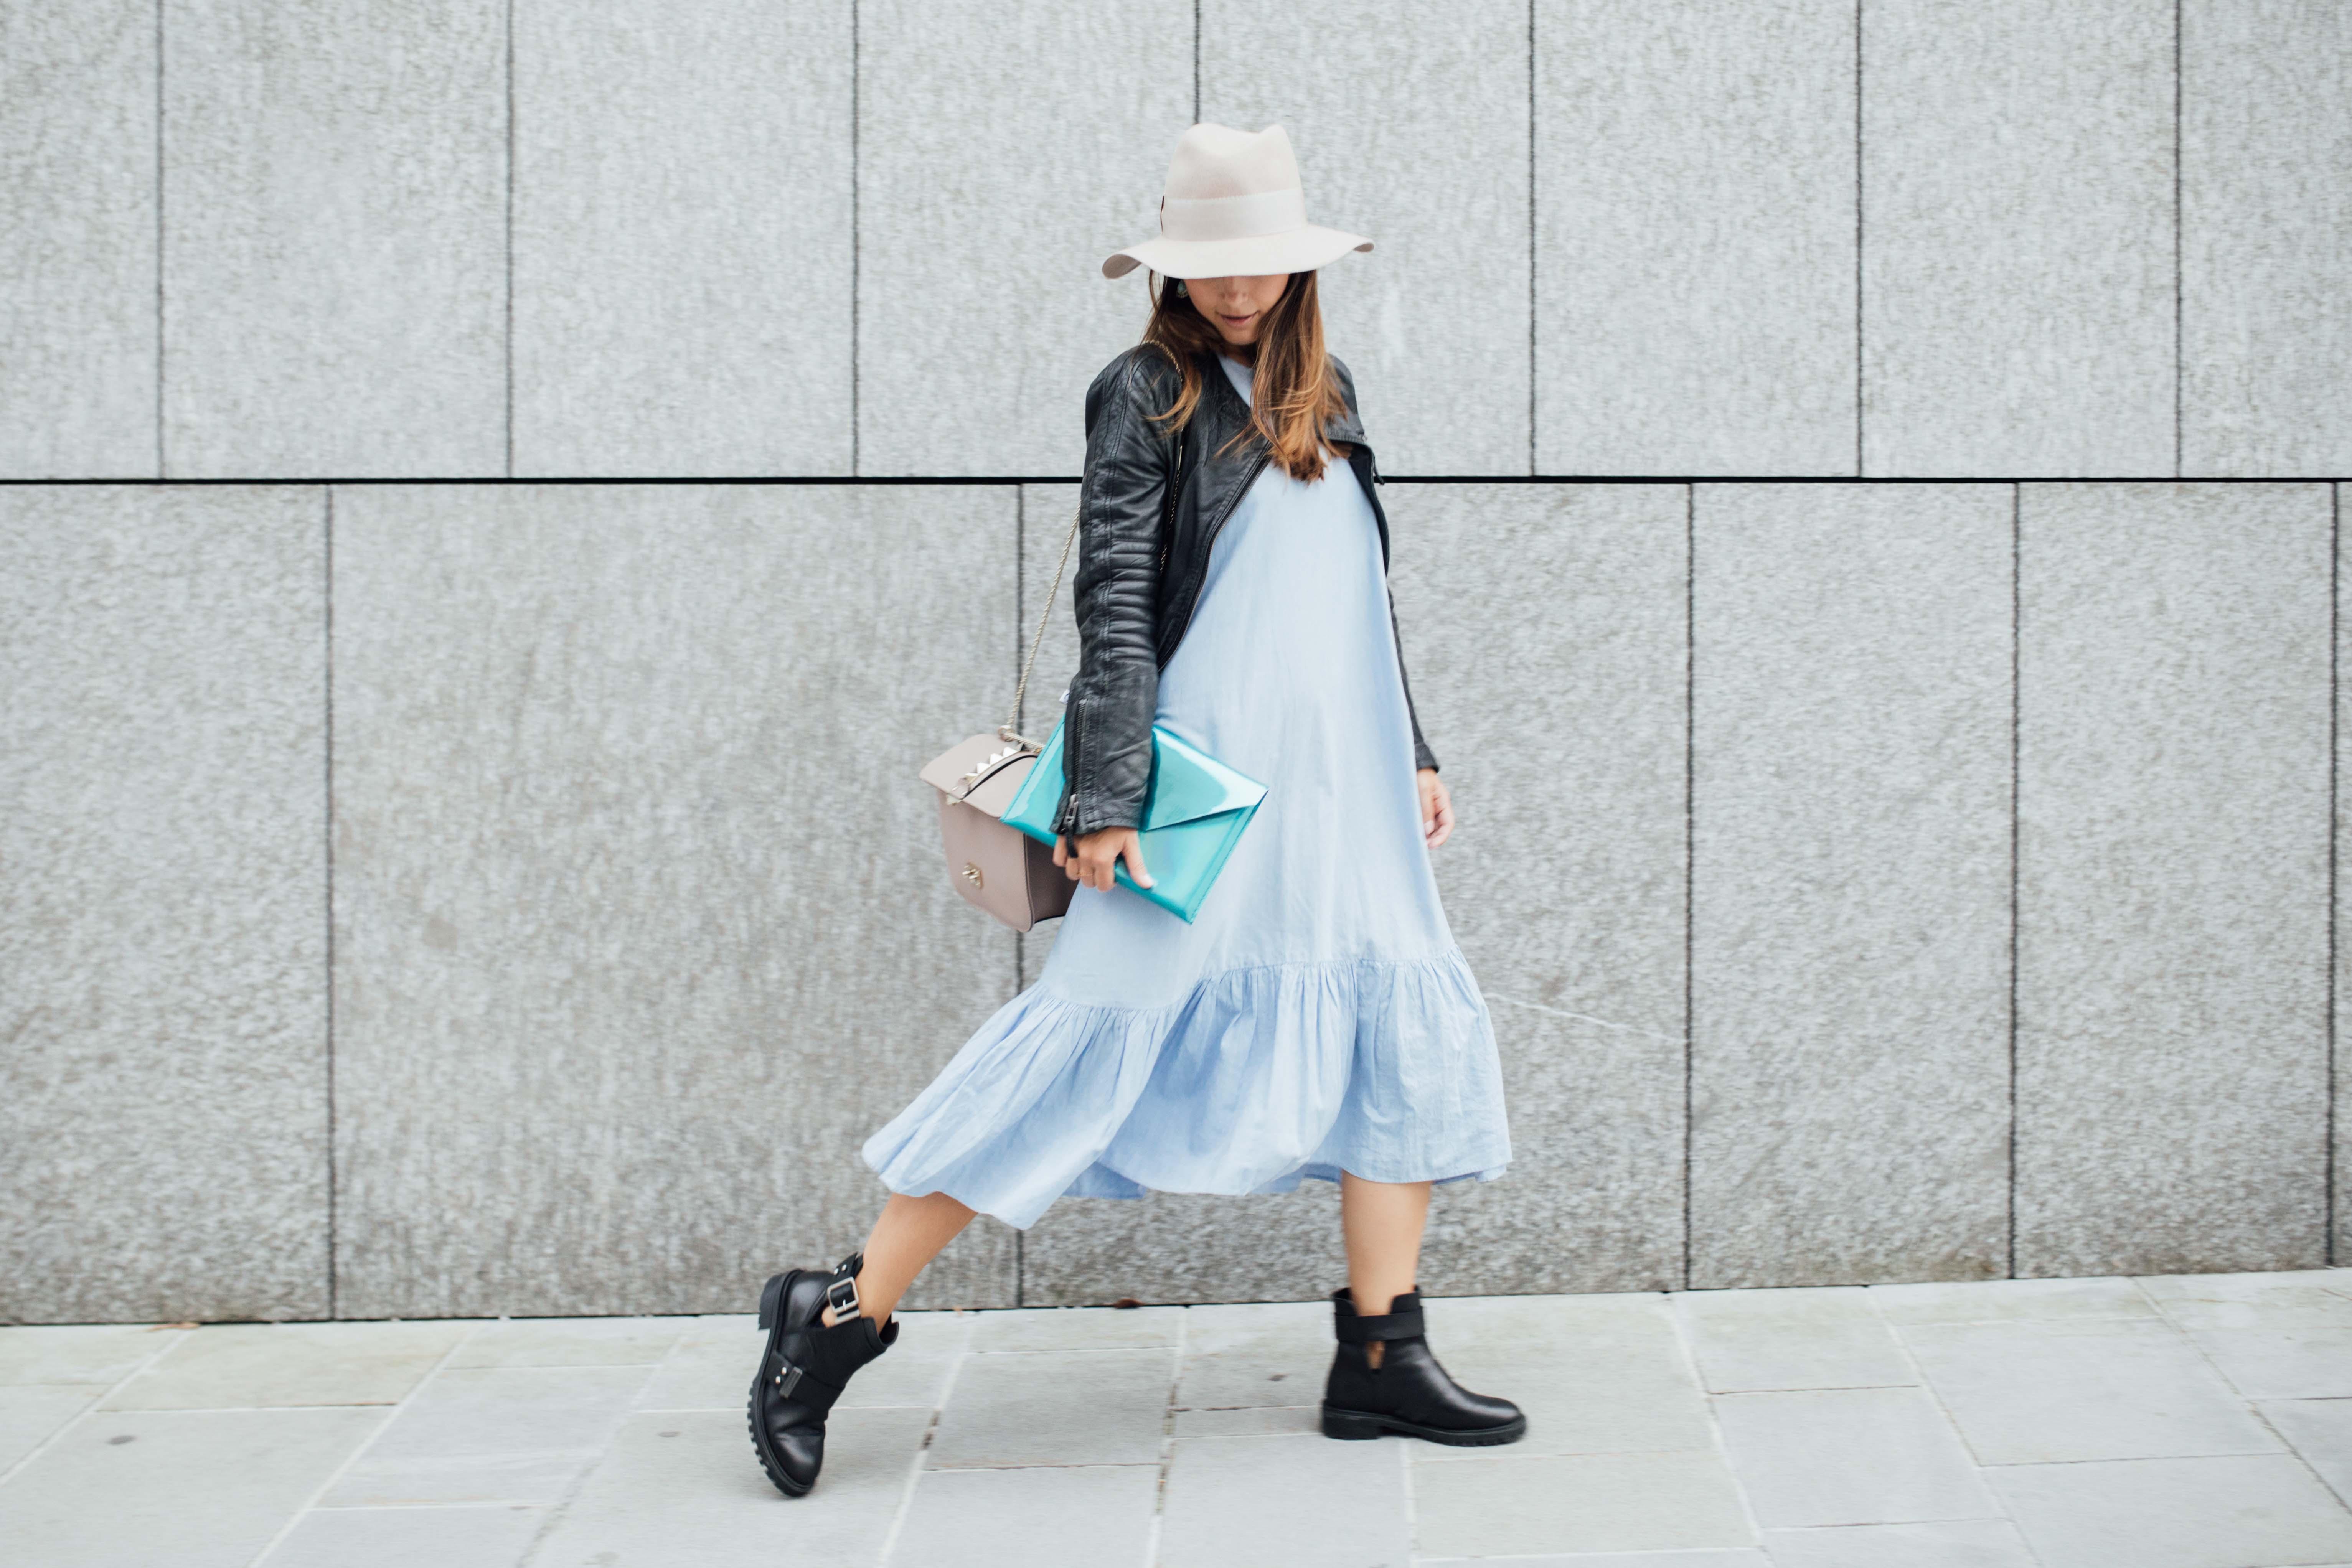 160919_yrml_blue_dress_web-10